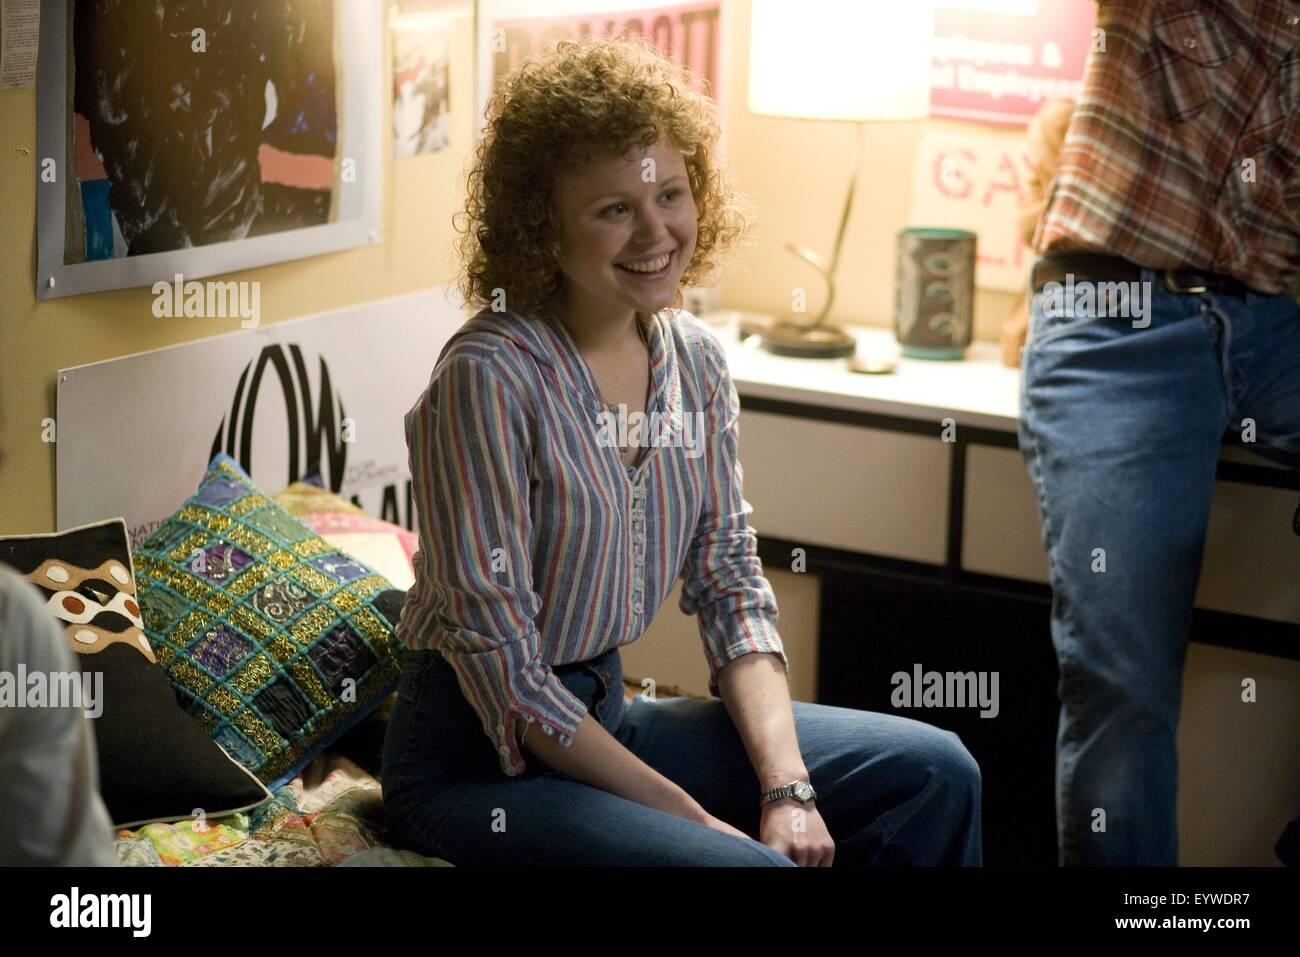 Milk Year : 2008 USA Director : Gus van Sant Alison Pill - Stock Image